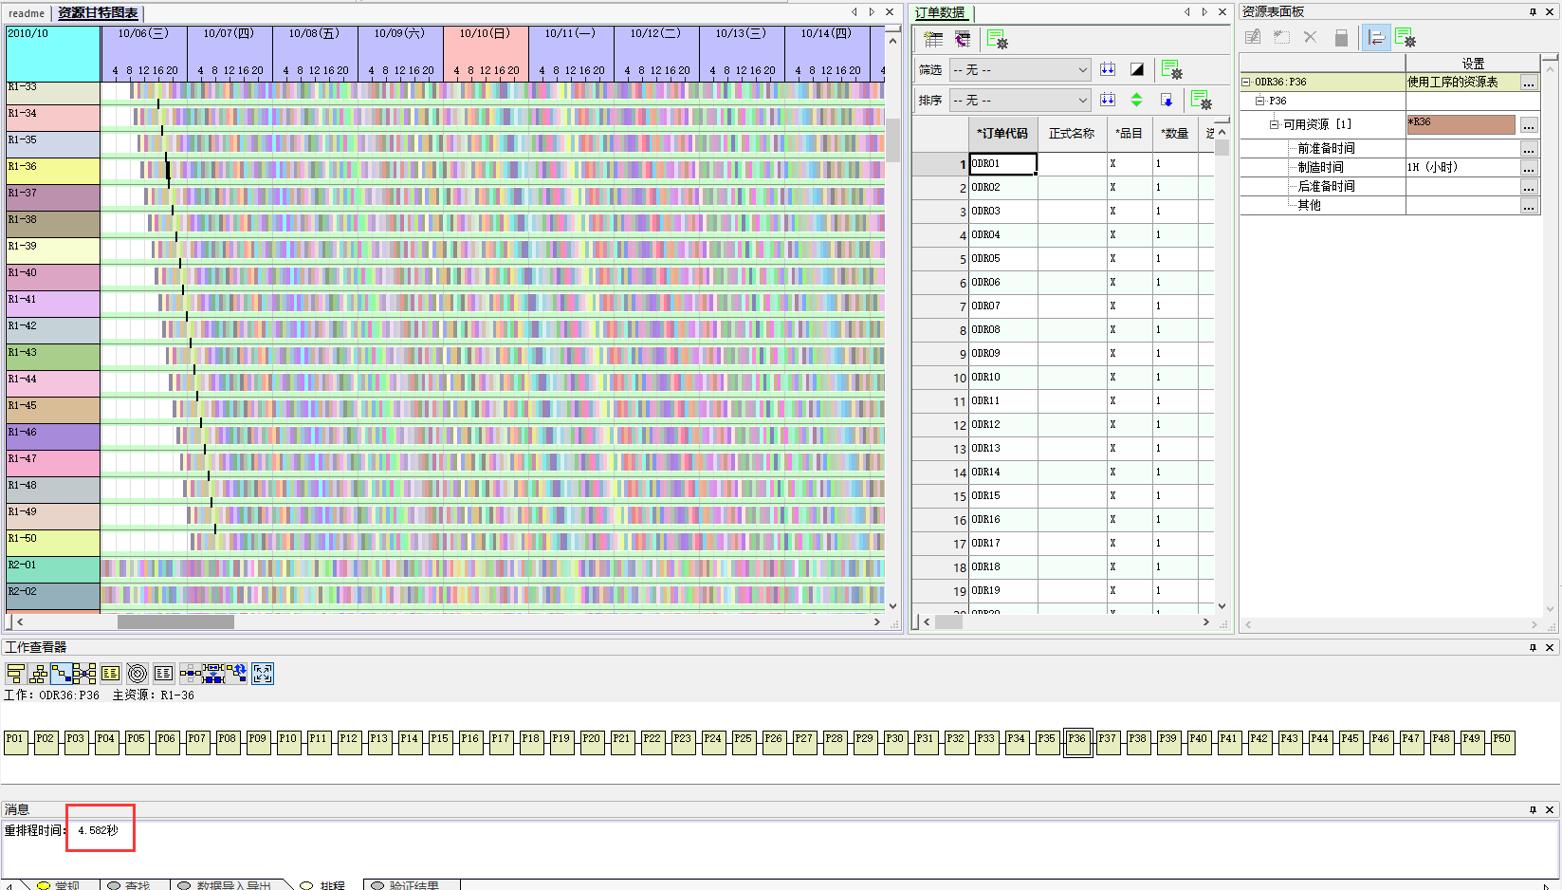 FLEXSCHE系统强大的排程计算效率,10万工作数(50道工序 * 2000笔订单 * 每工序5个可选资源),4-5秒计算完成!使用普通笔记本电脑的成绩!实际场景中客户数据更为复杂,机器+模具+人员+替代物料...指数级增长的要素组合,极为需要可快速完成排程计算的系统!